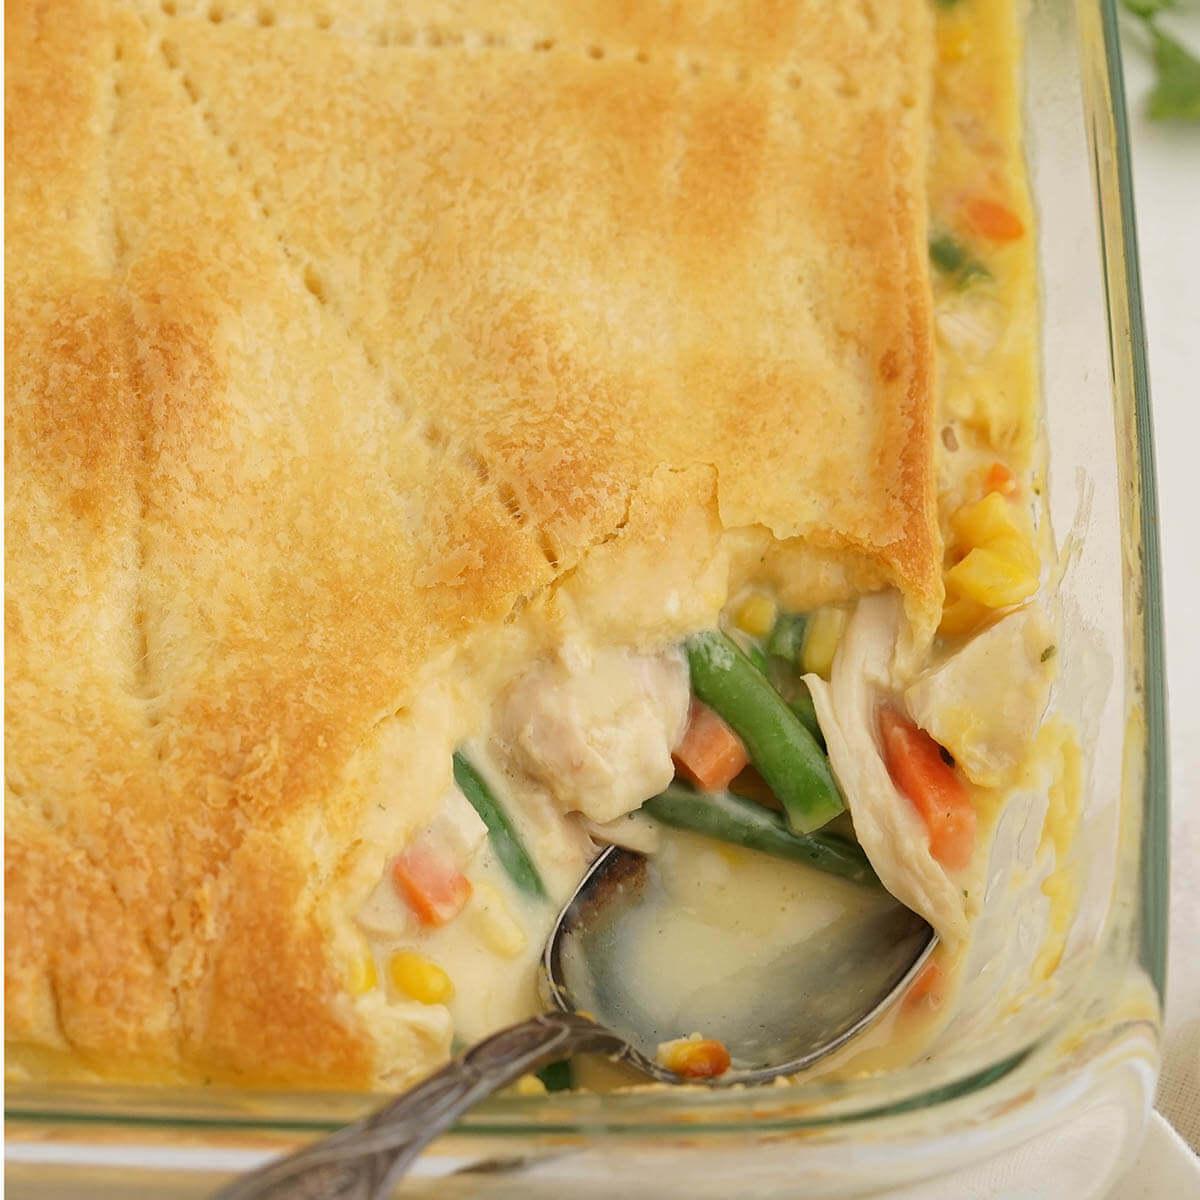 Chicken Pot Pie in Casserole dish with serving spoon.